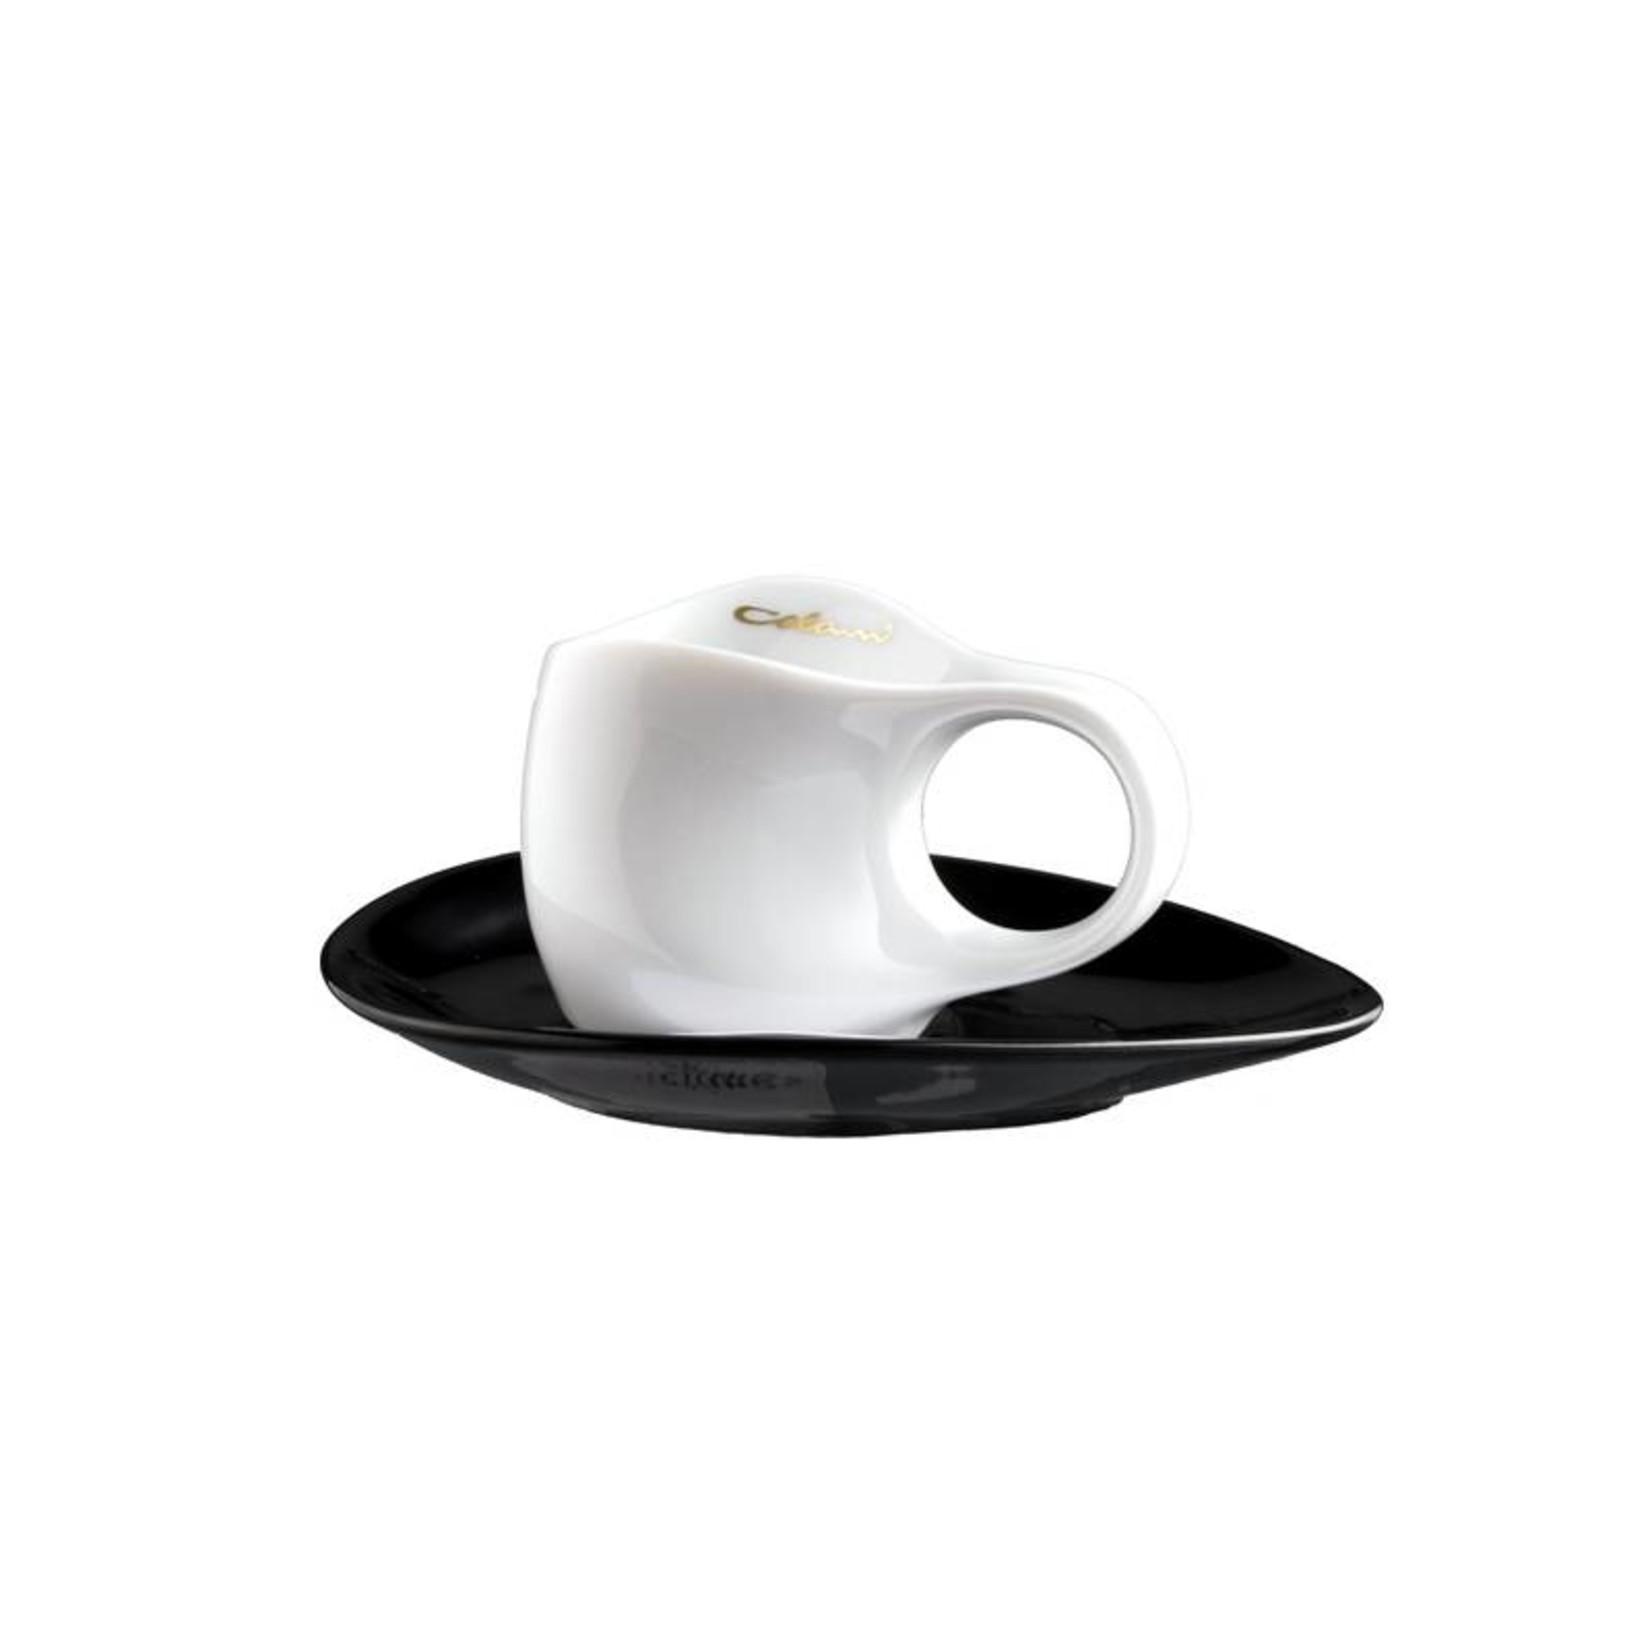 Colani Porzellanserie Colani Espressotasse 2- teilig in Weiß